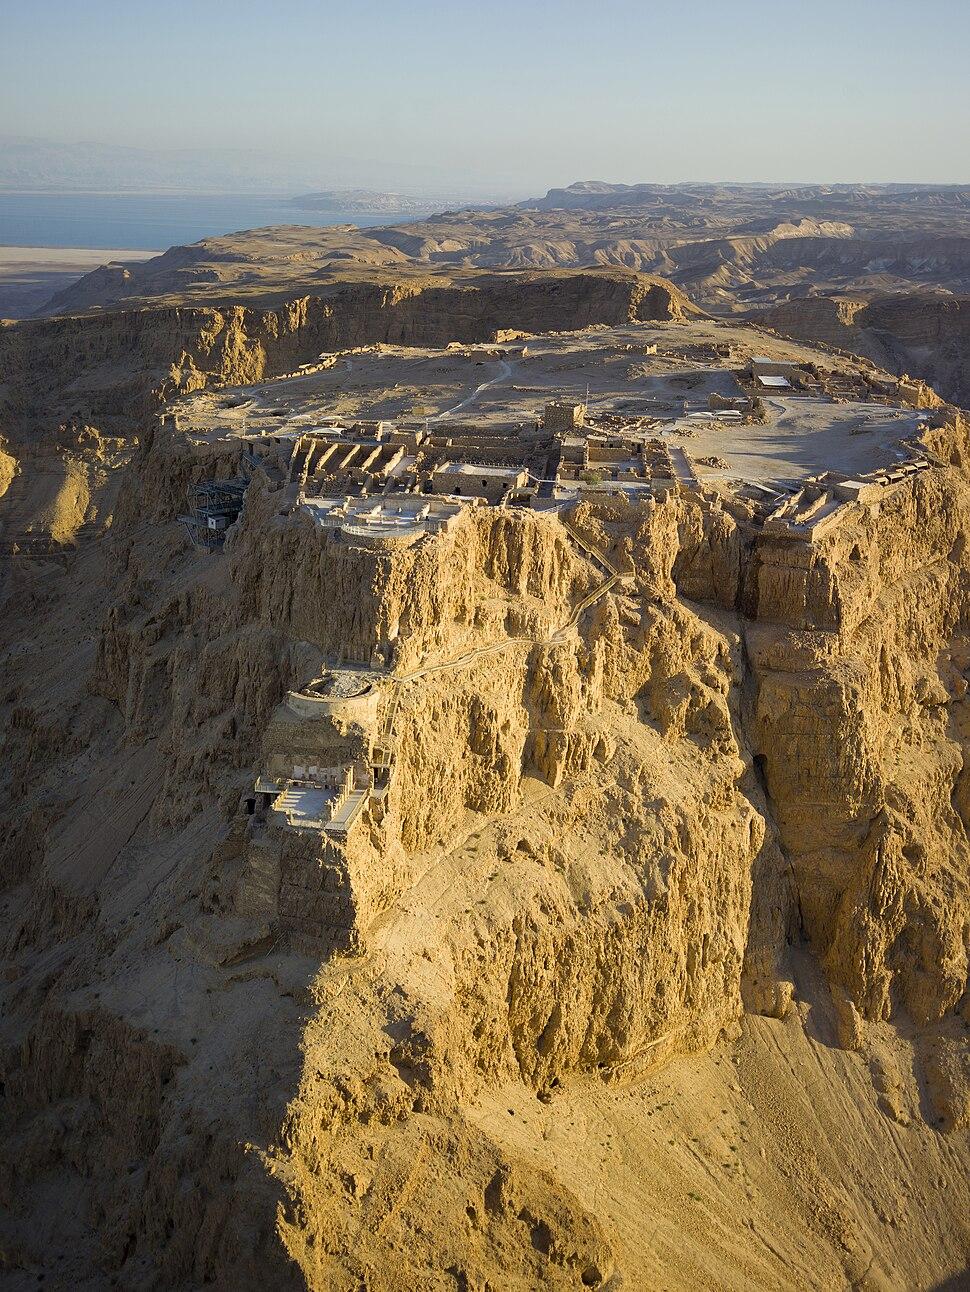 Israel-2013-Aerial 21-Masada